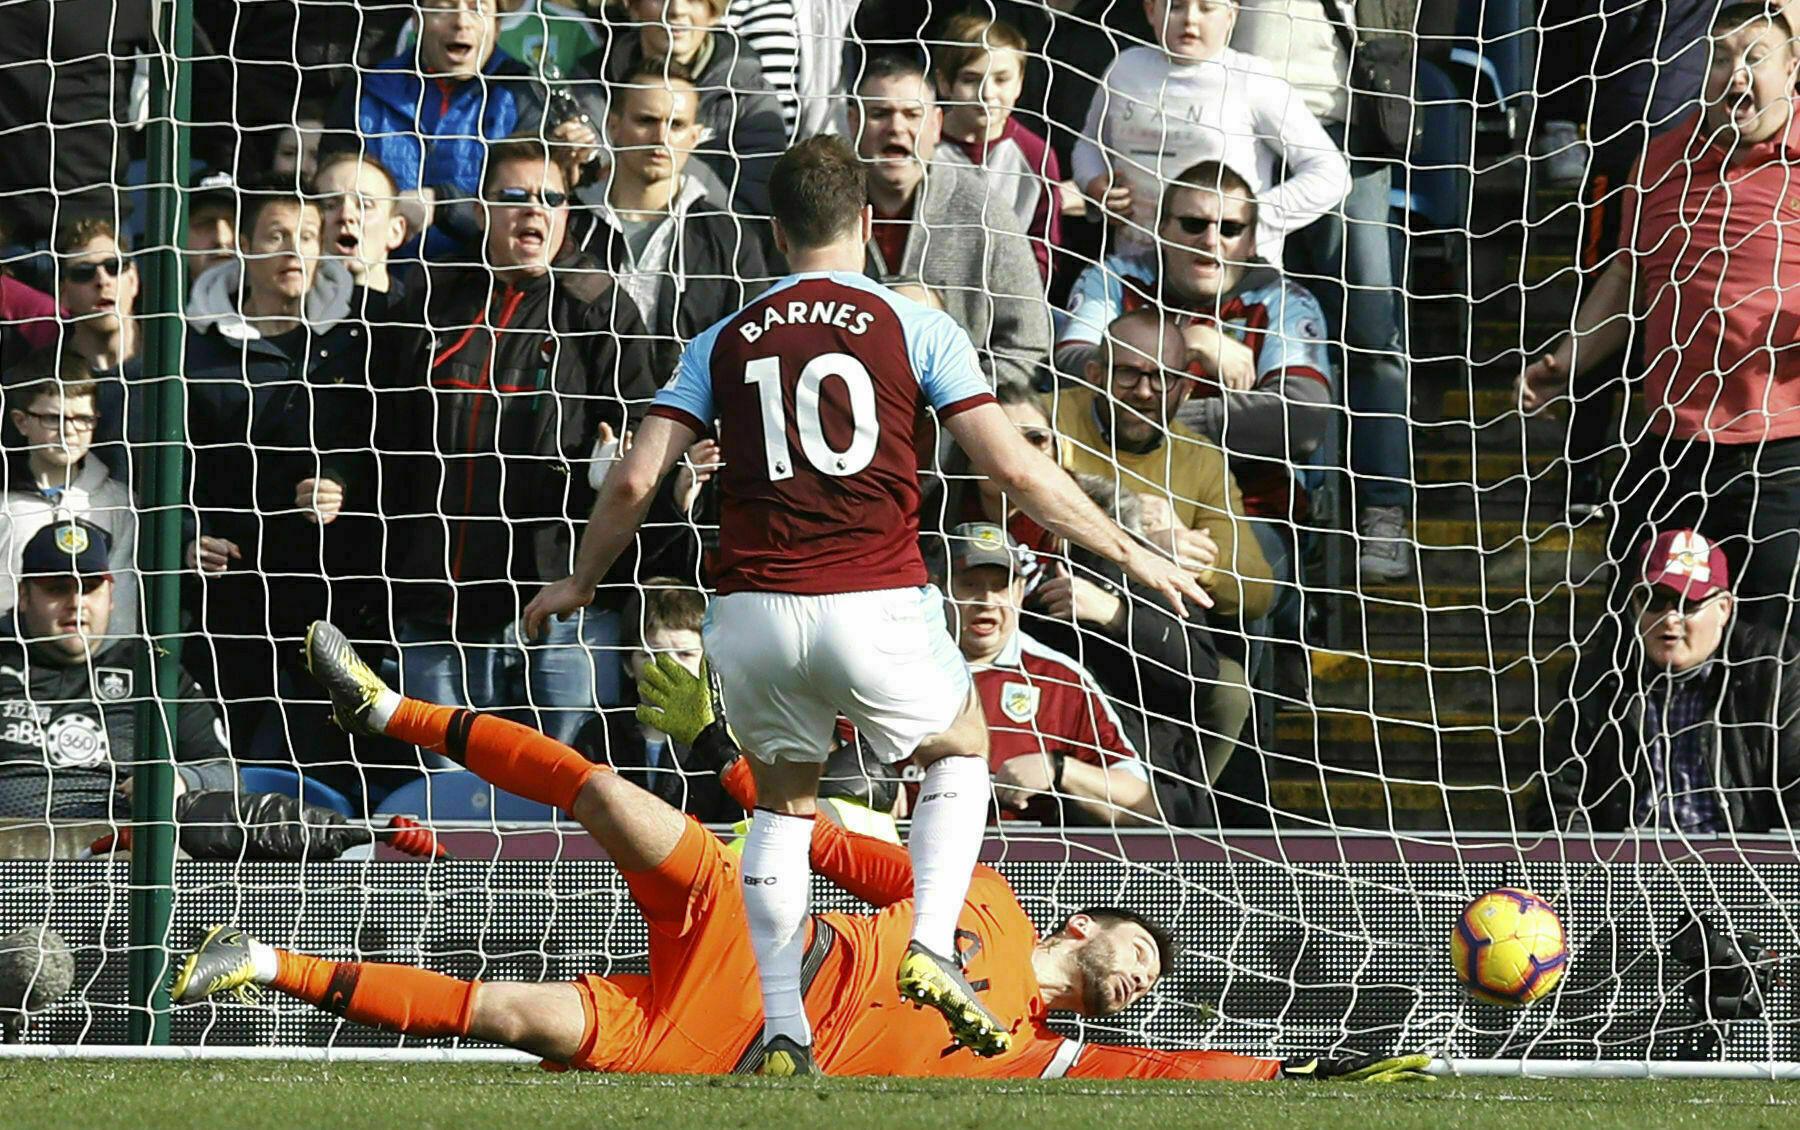 Pese a gol de Kane, Tottenham sucumbe en Burnley